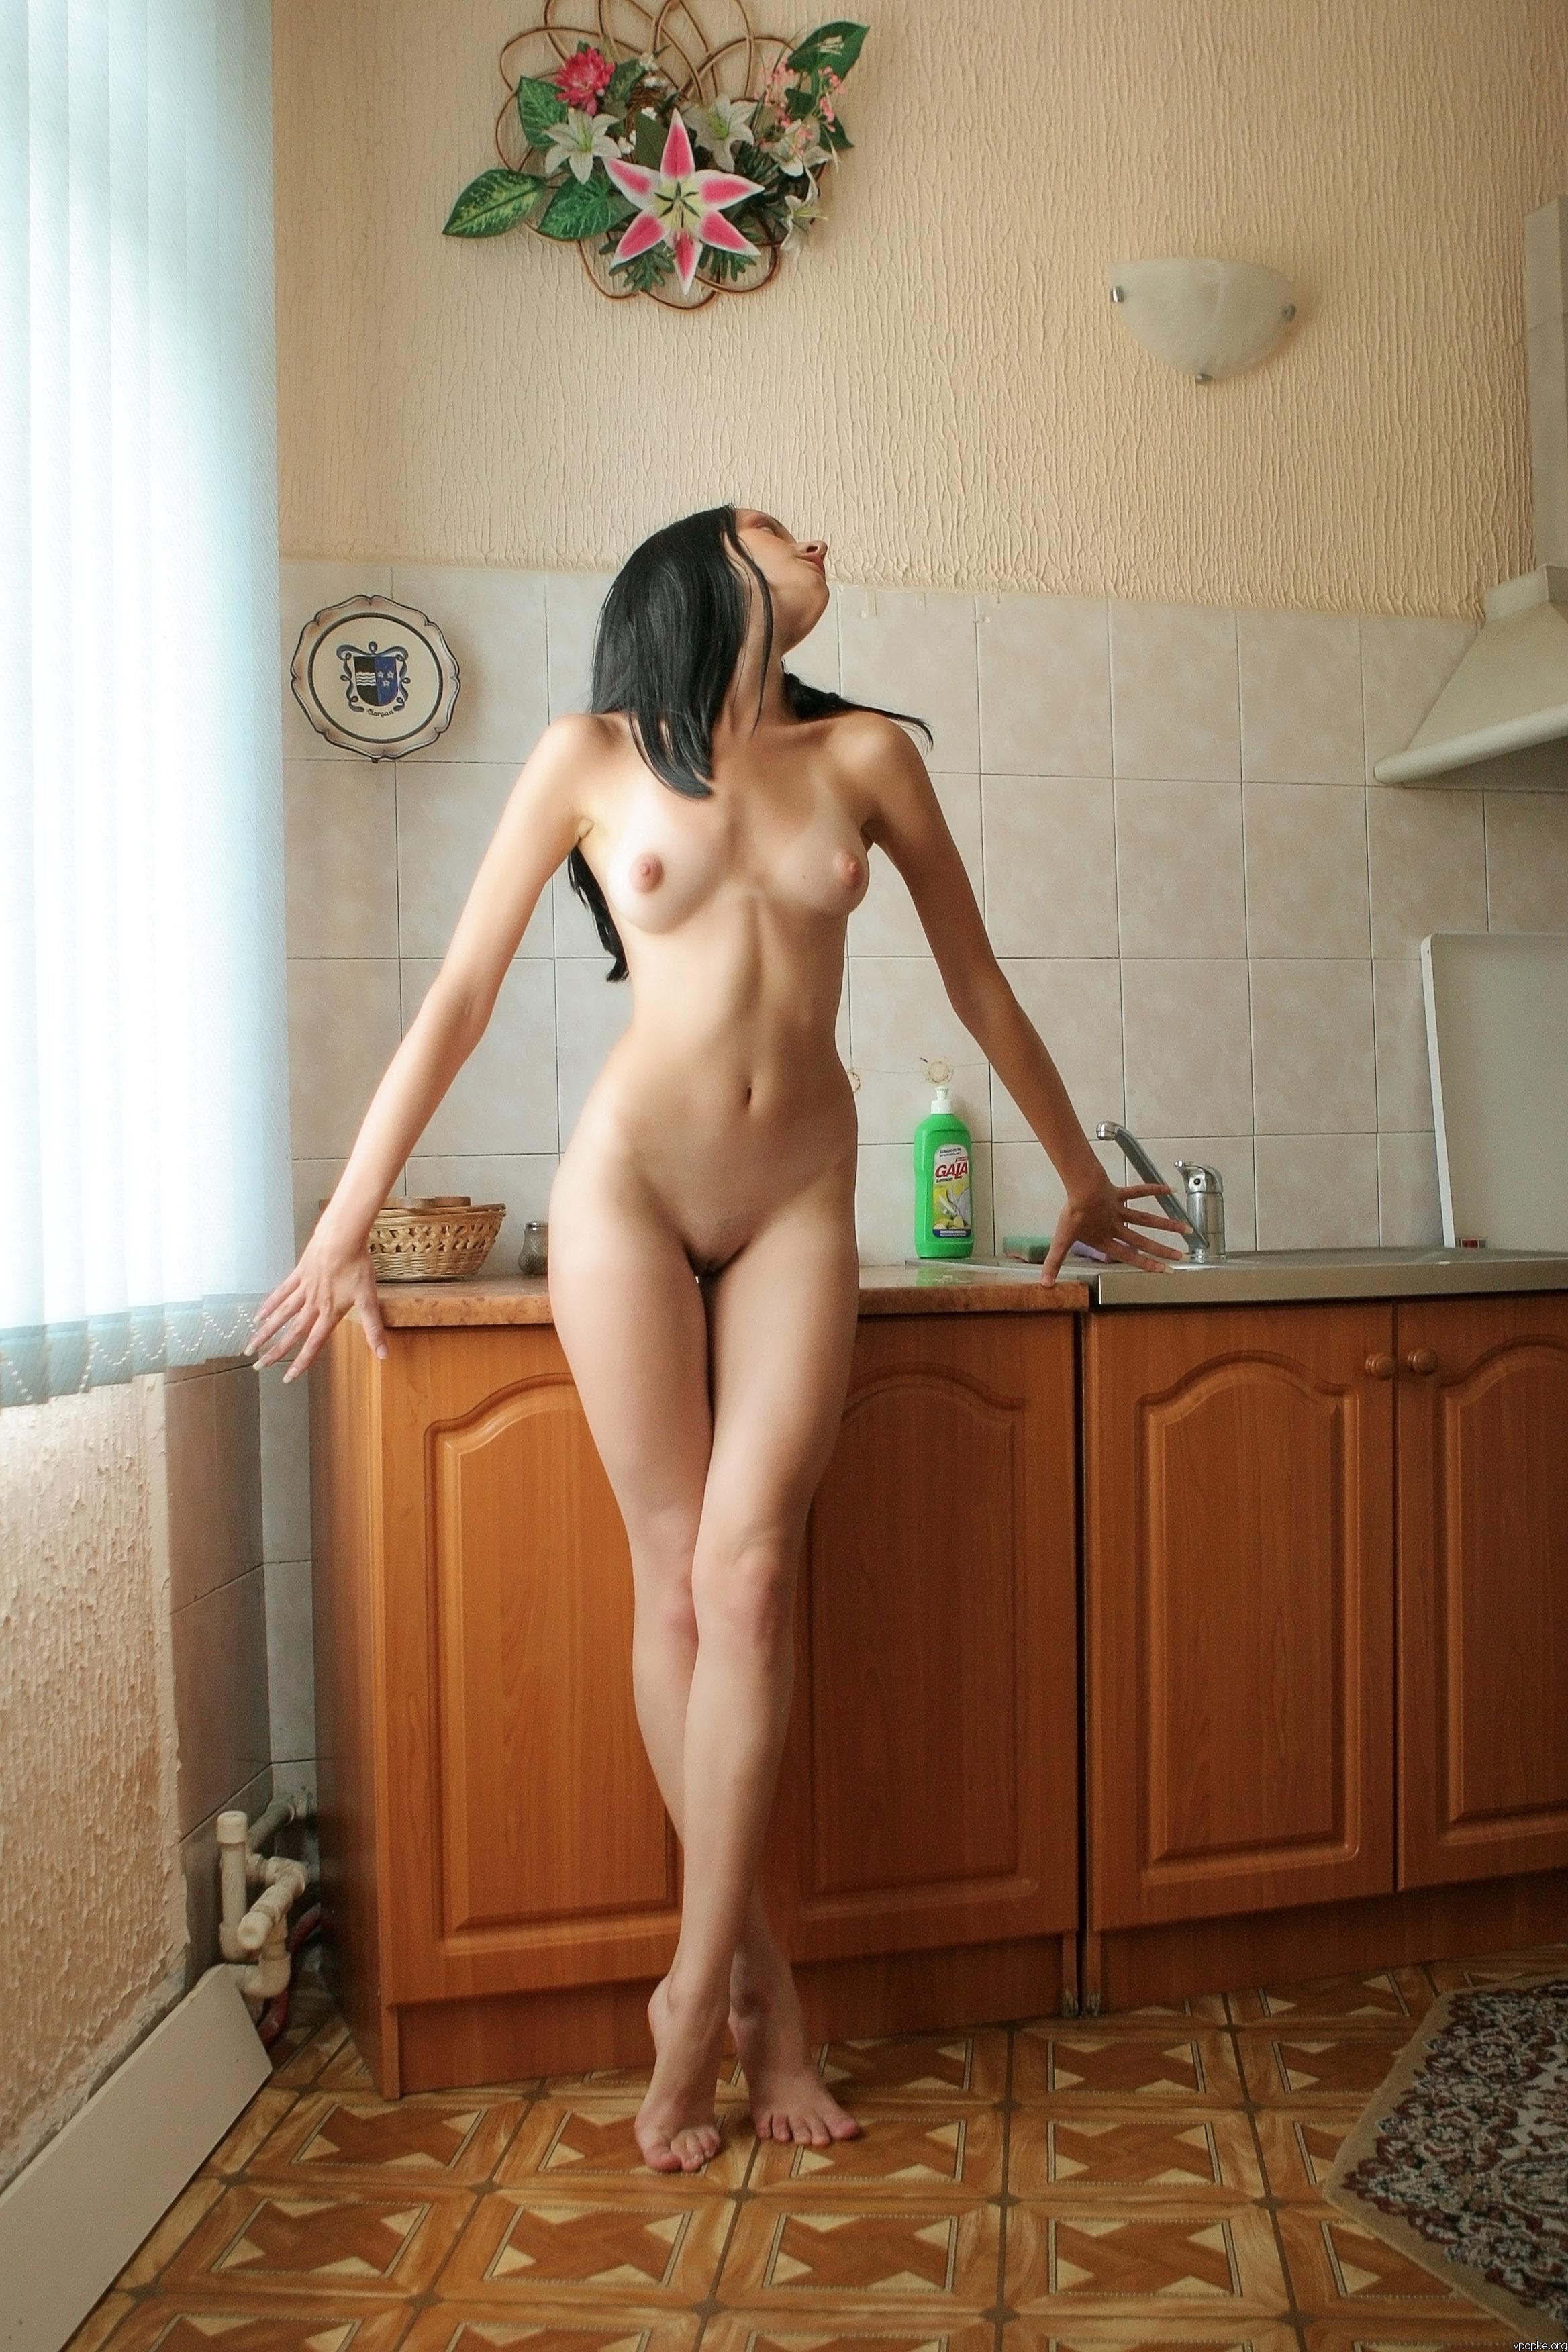 https://boobsmo.com/content/195/boobsmo_com_0000__75.jpg